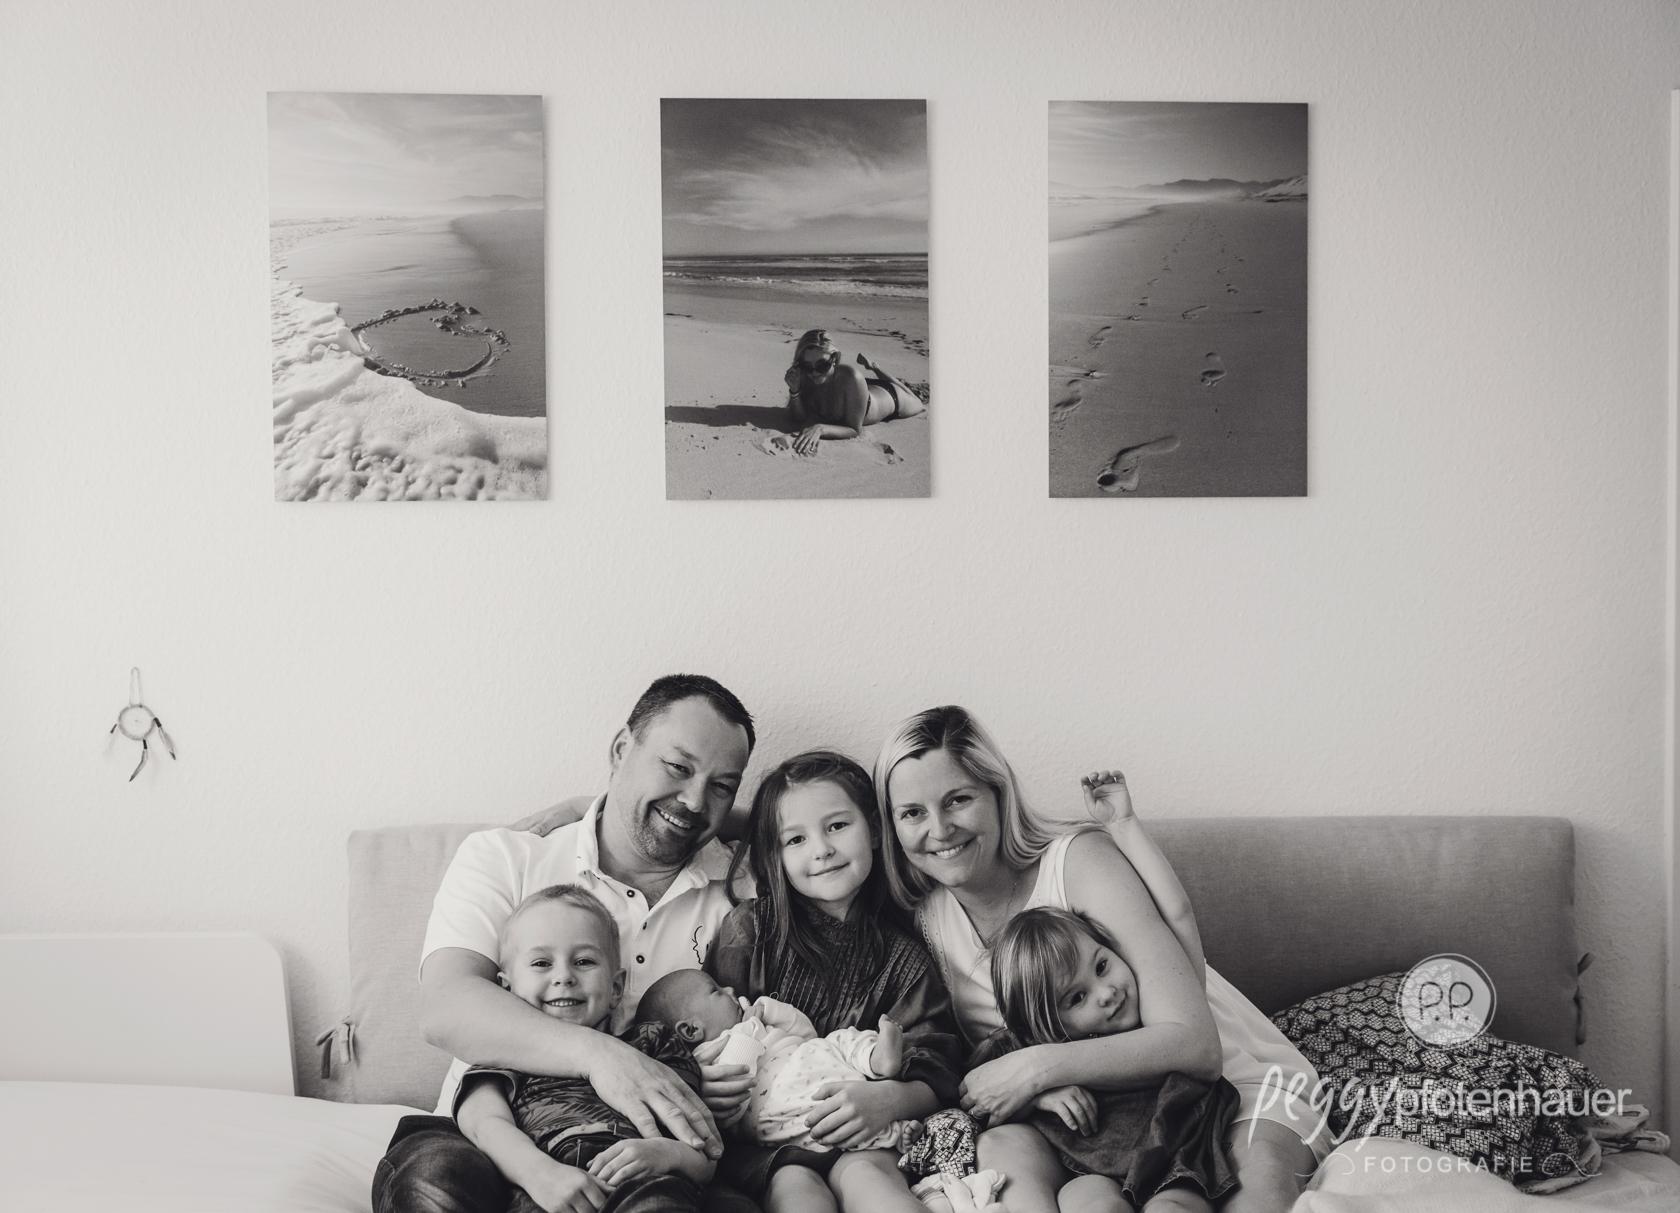 Familienphotos zu Hause